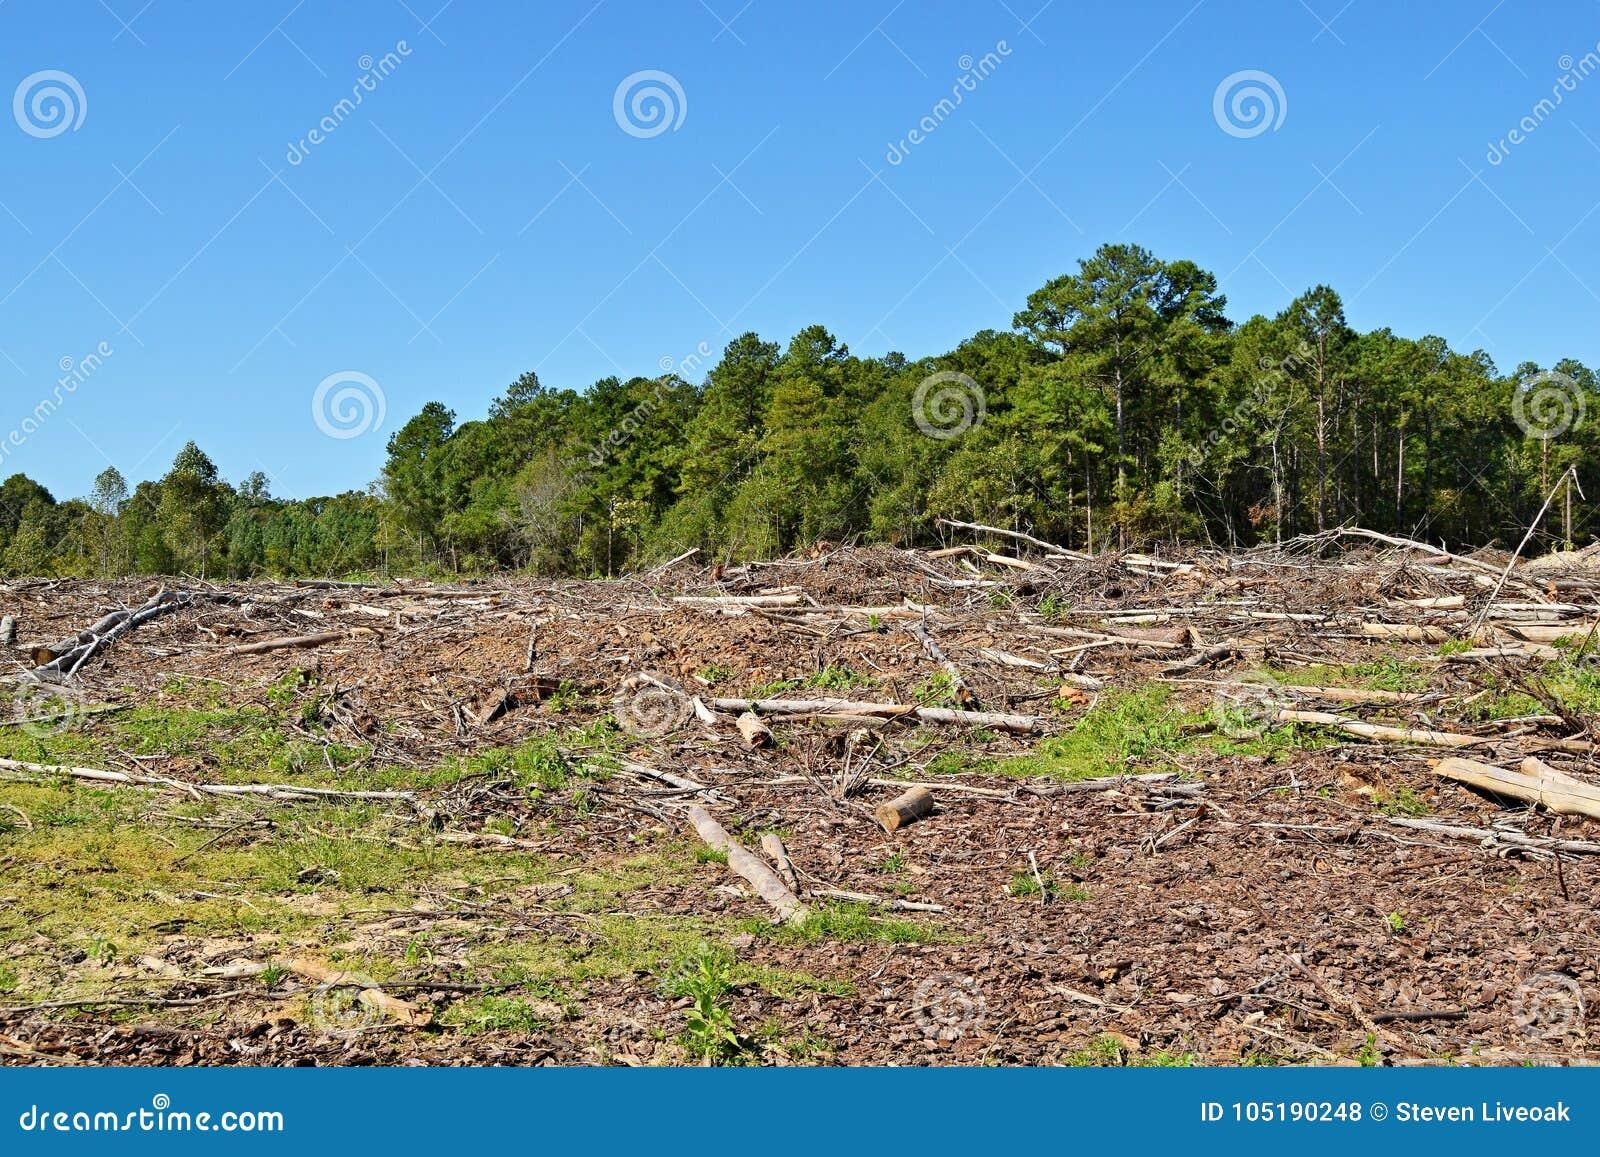 Deforestedland door machines wordt ontruimd die